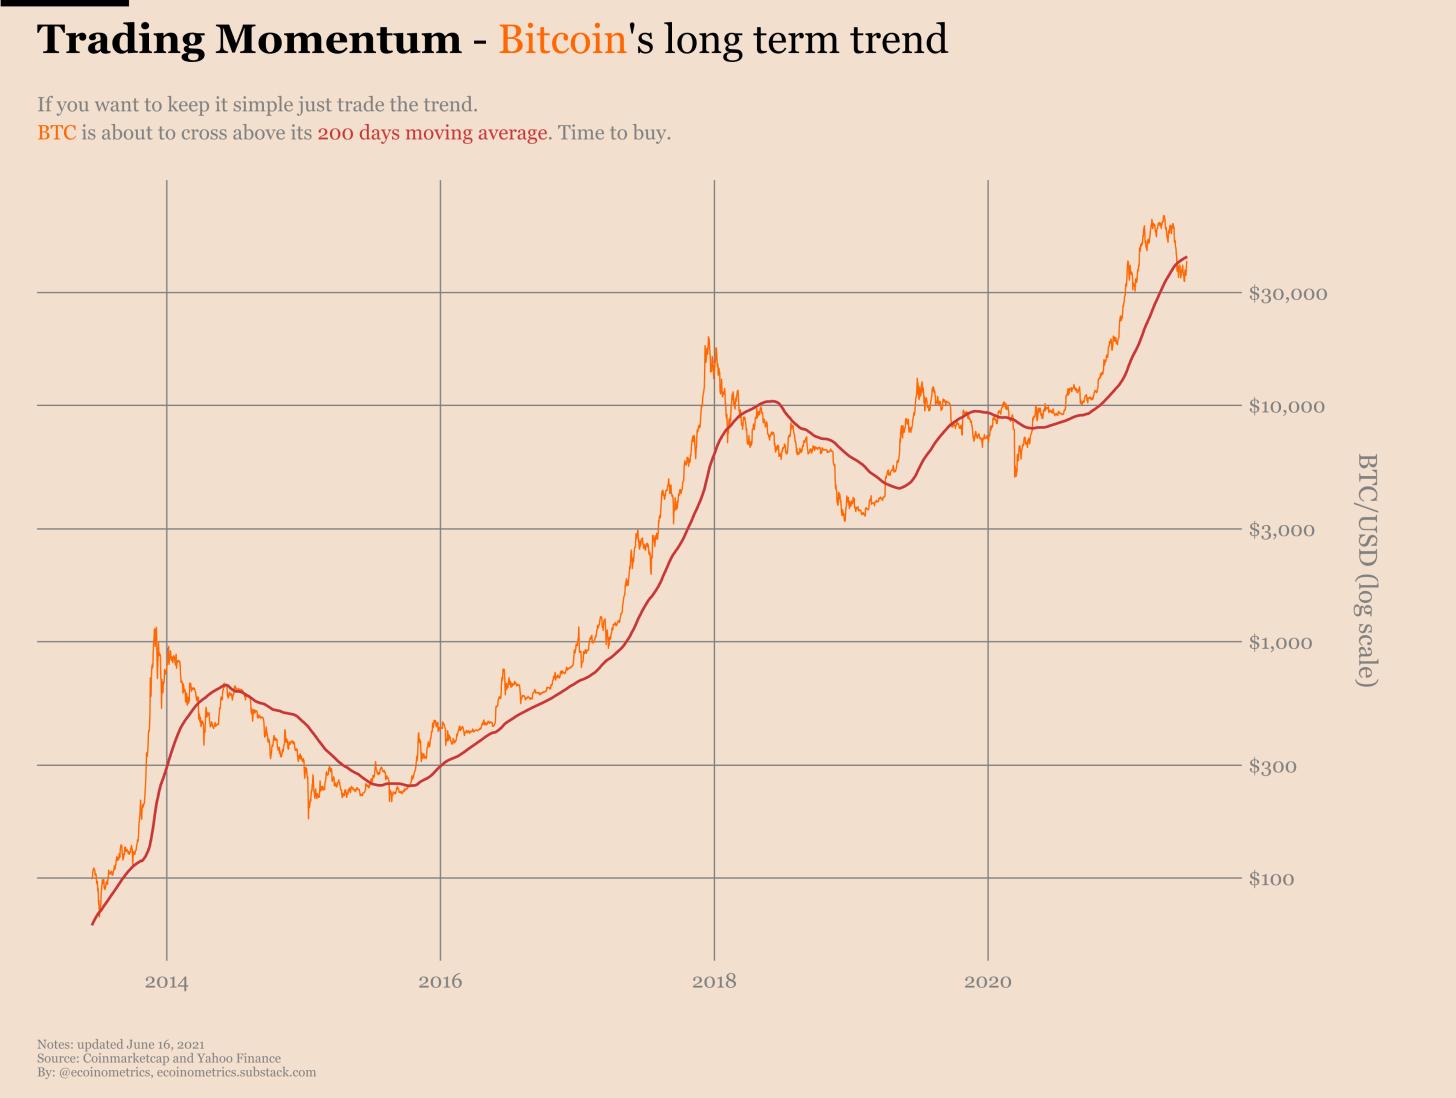 Esta estrategia para Bitcoin ha sido rentable desde 2014